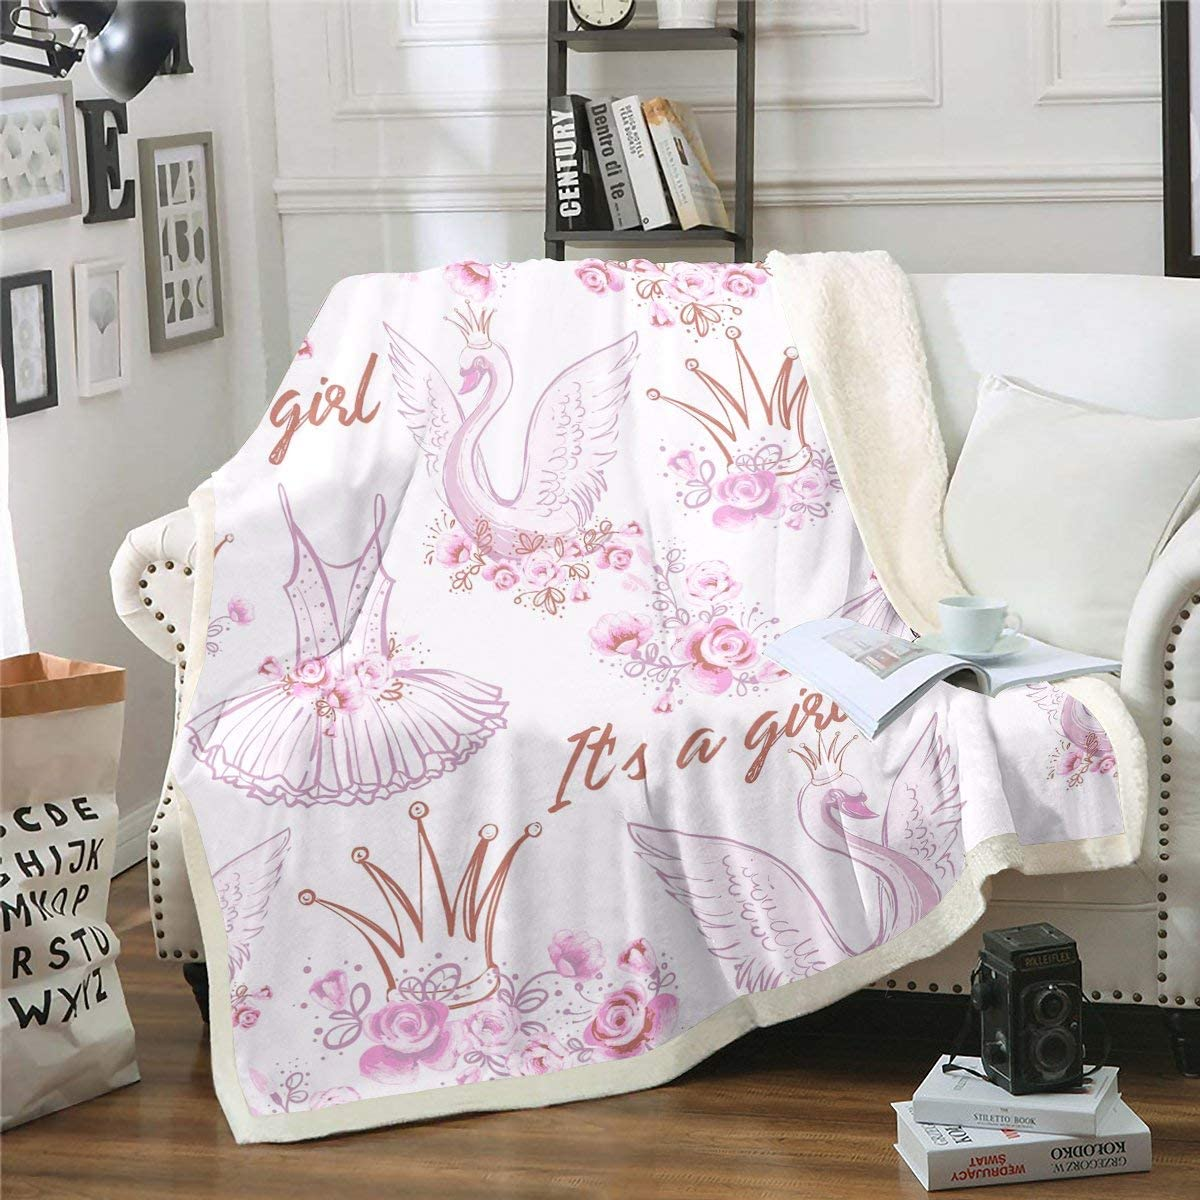 Girls Fleece Throw Blanket Baby Courier Milwaukee Mall shipping free Girl B Ballerina Pink Swan Fuzzy